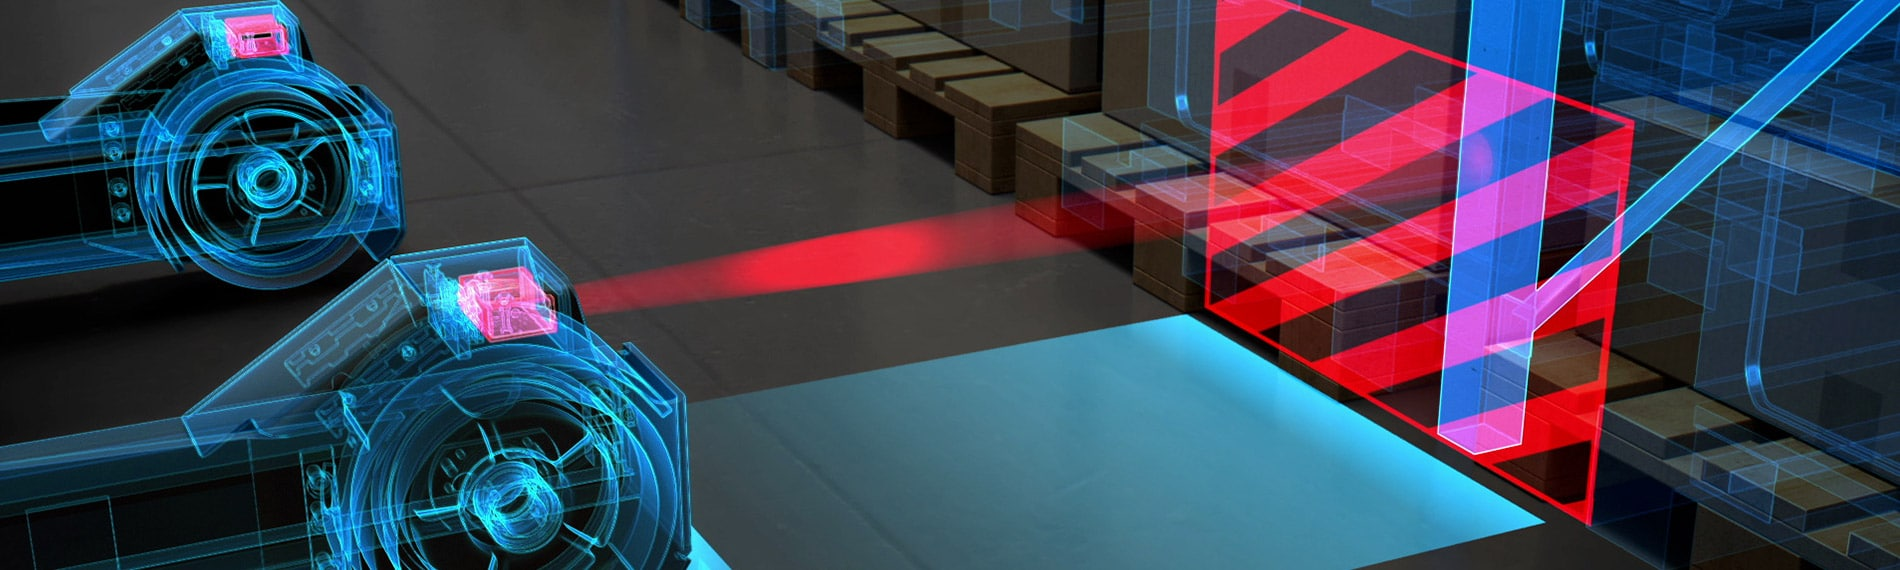 header desktop anfahrschutz rammschutz regal rack protection sensor von linde